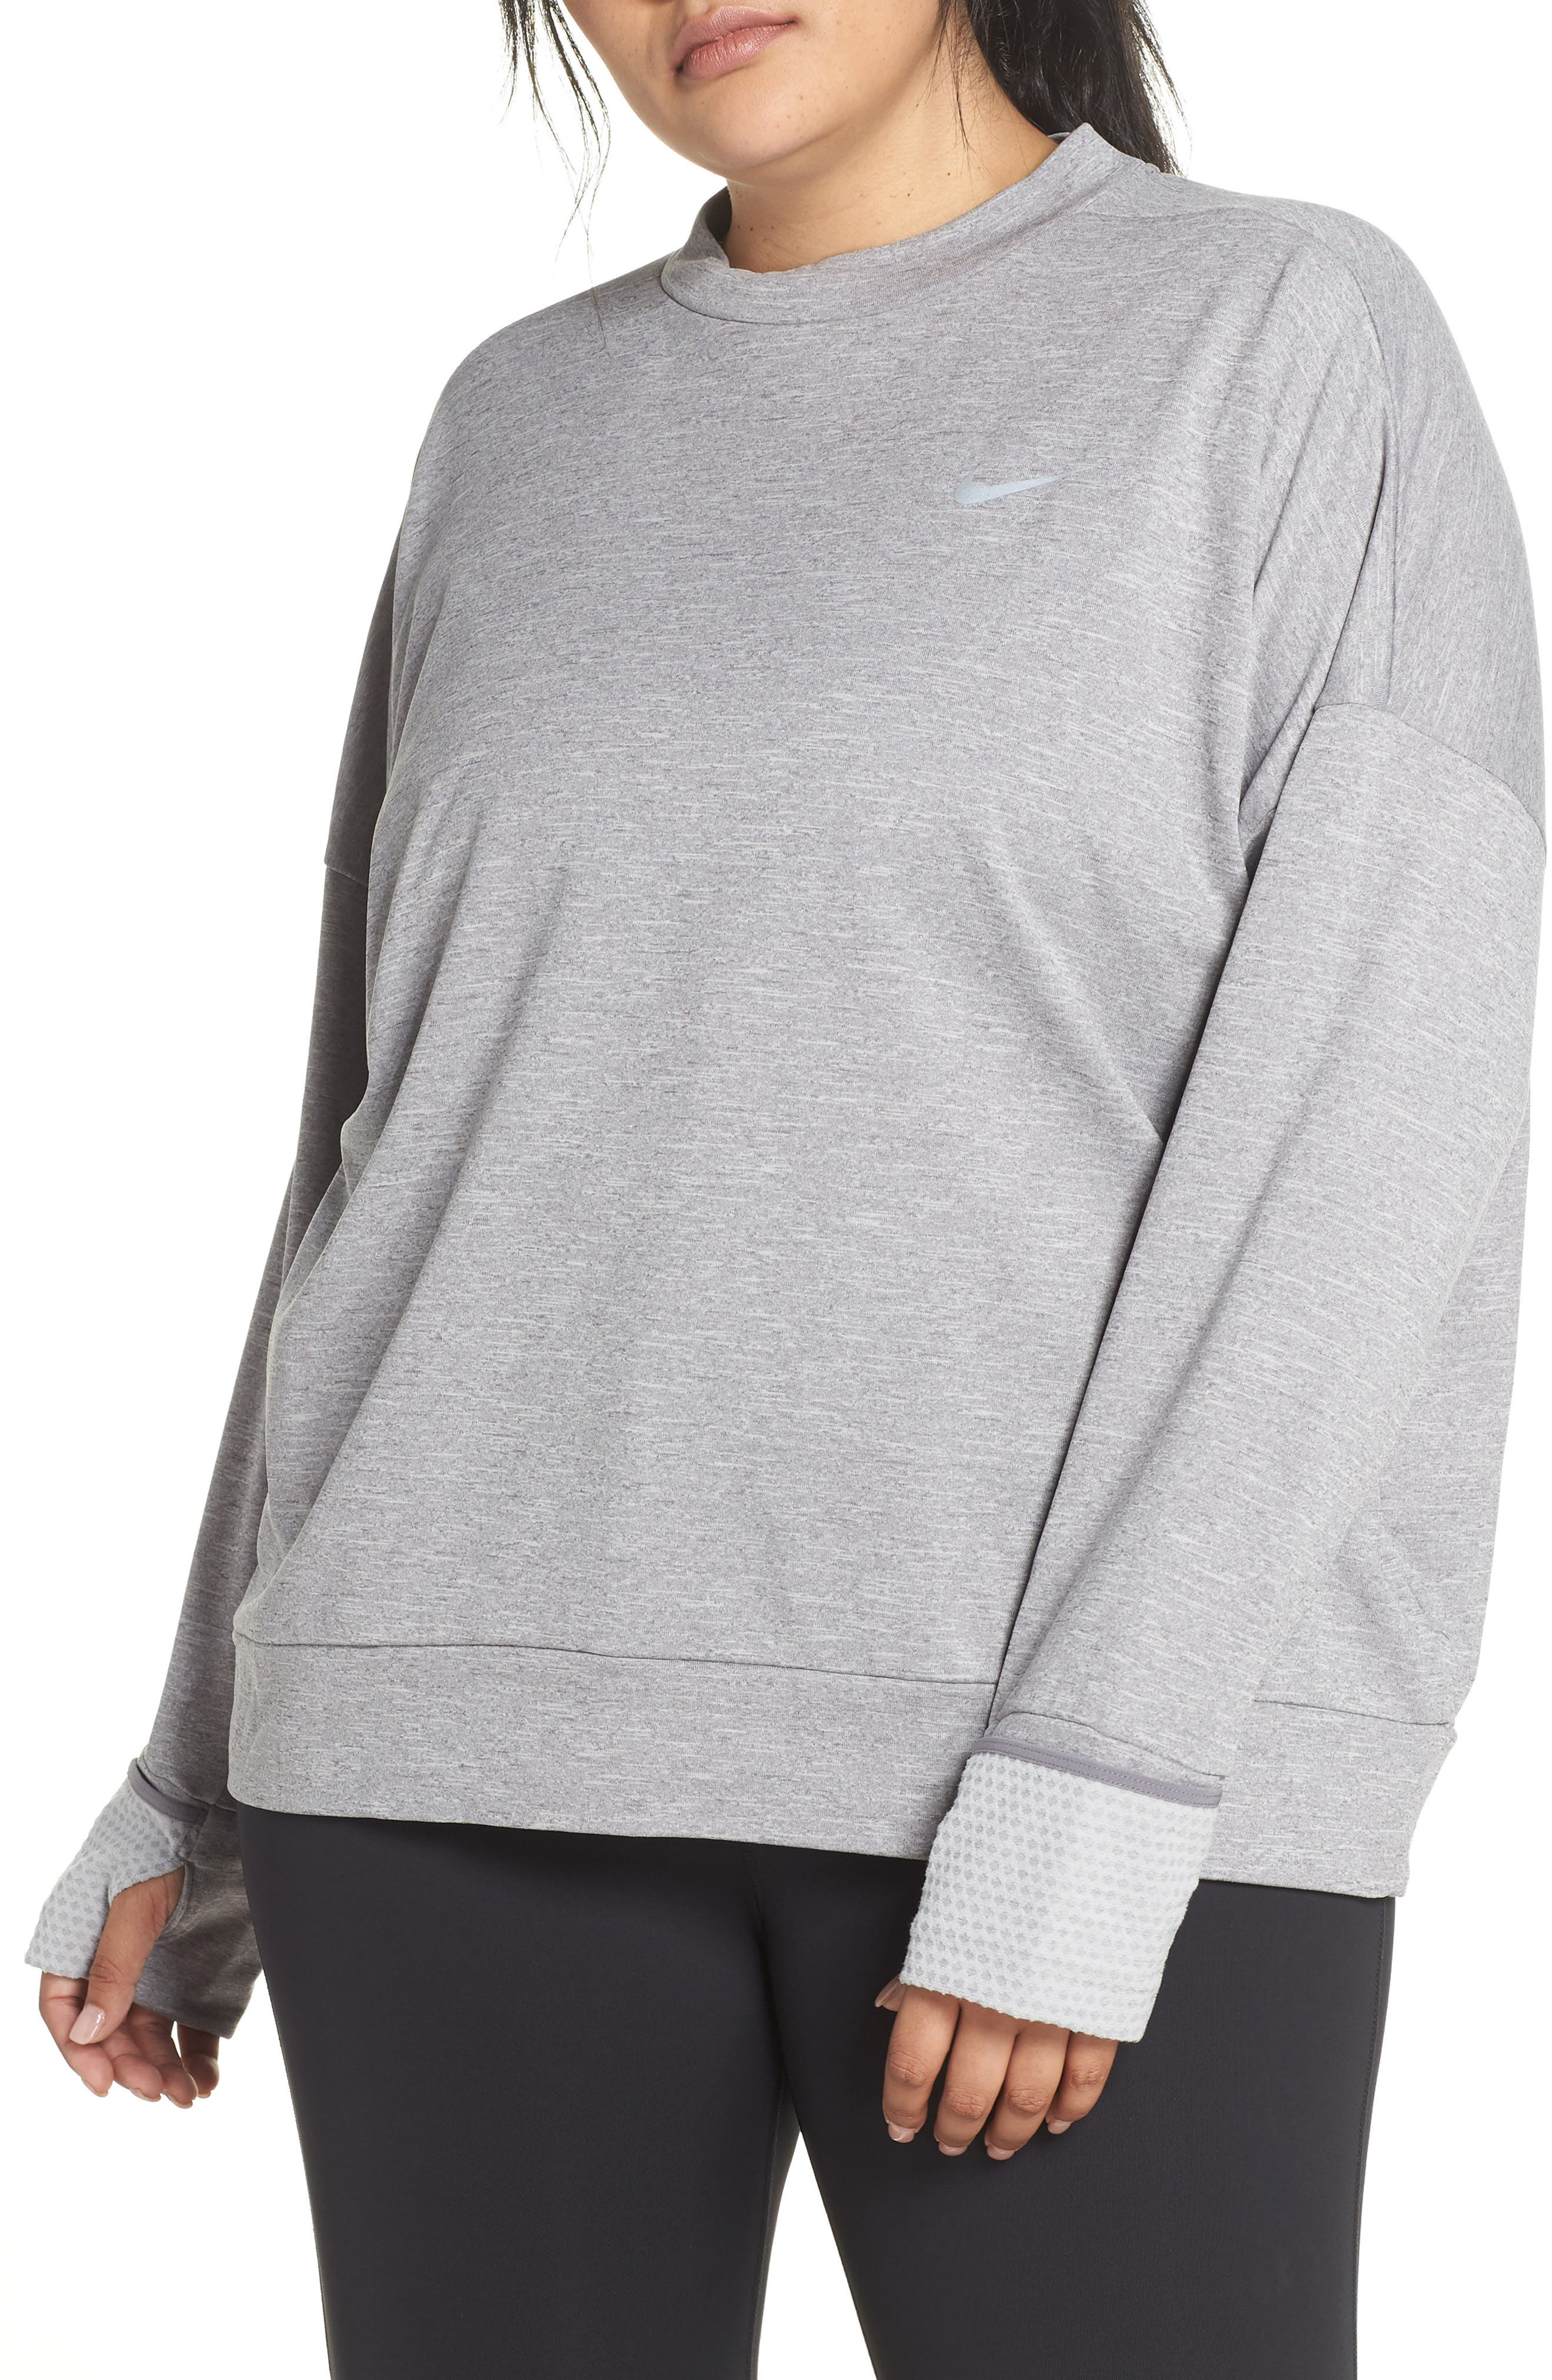 Therma Sphere Element Running Shirt, Main, color, GUNSMOKE/ HEATHER